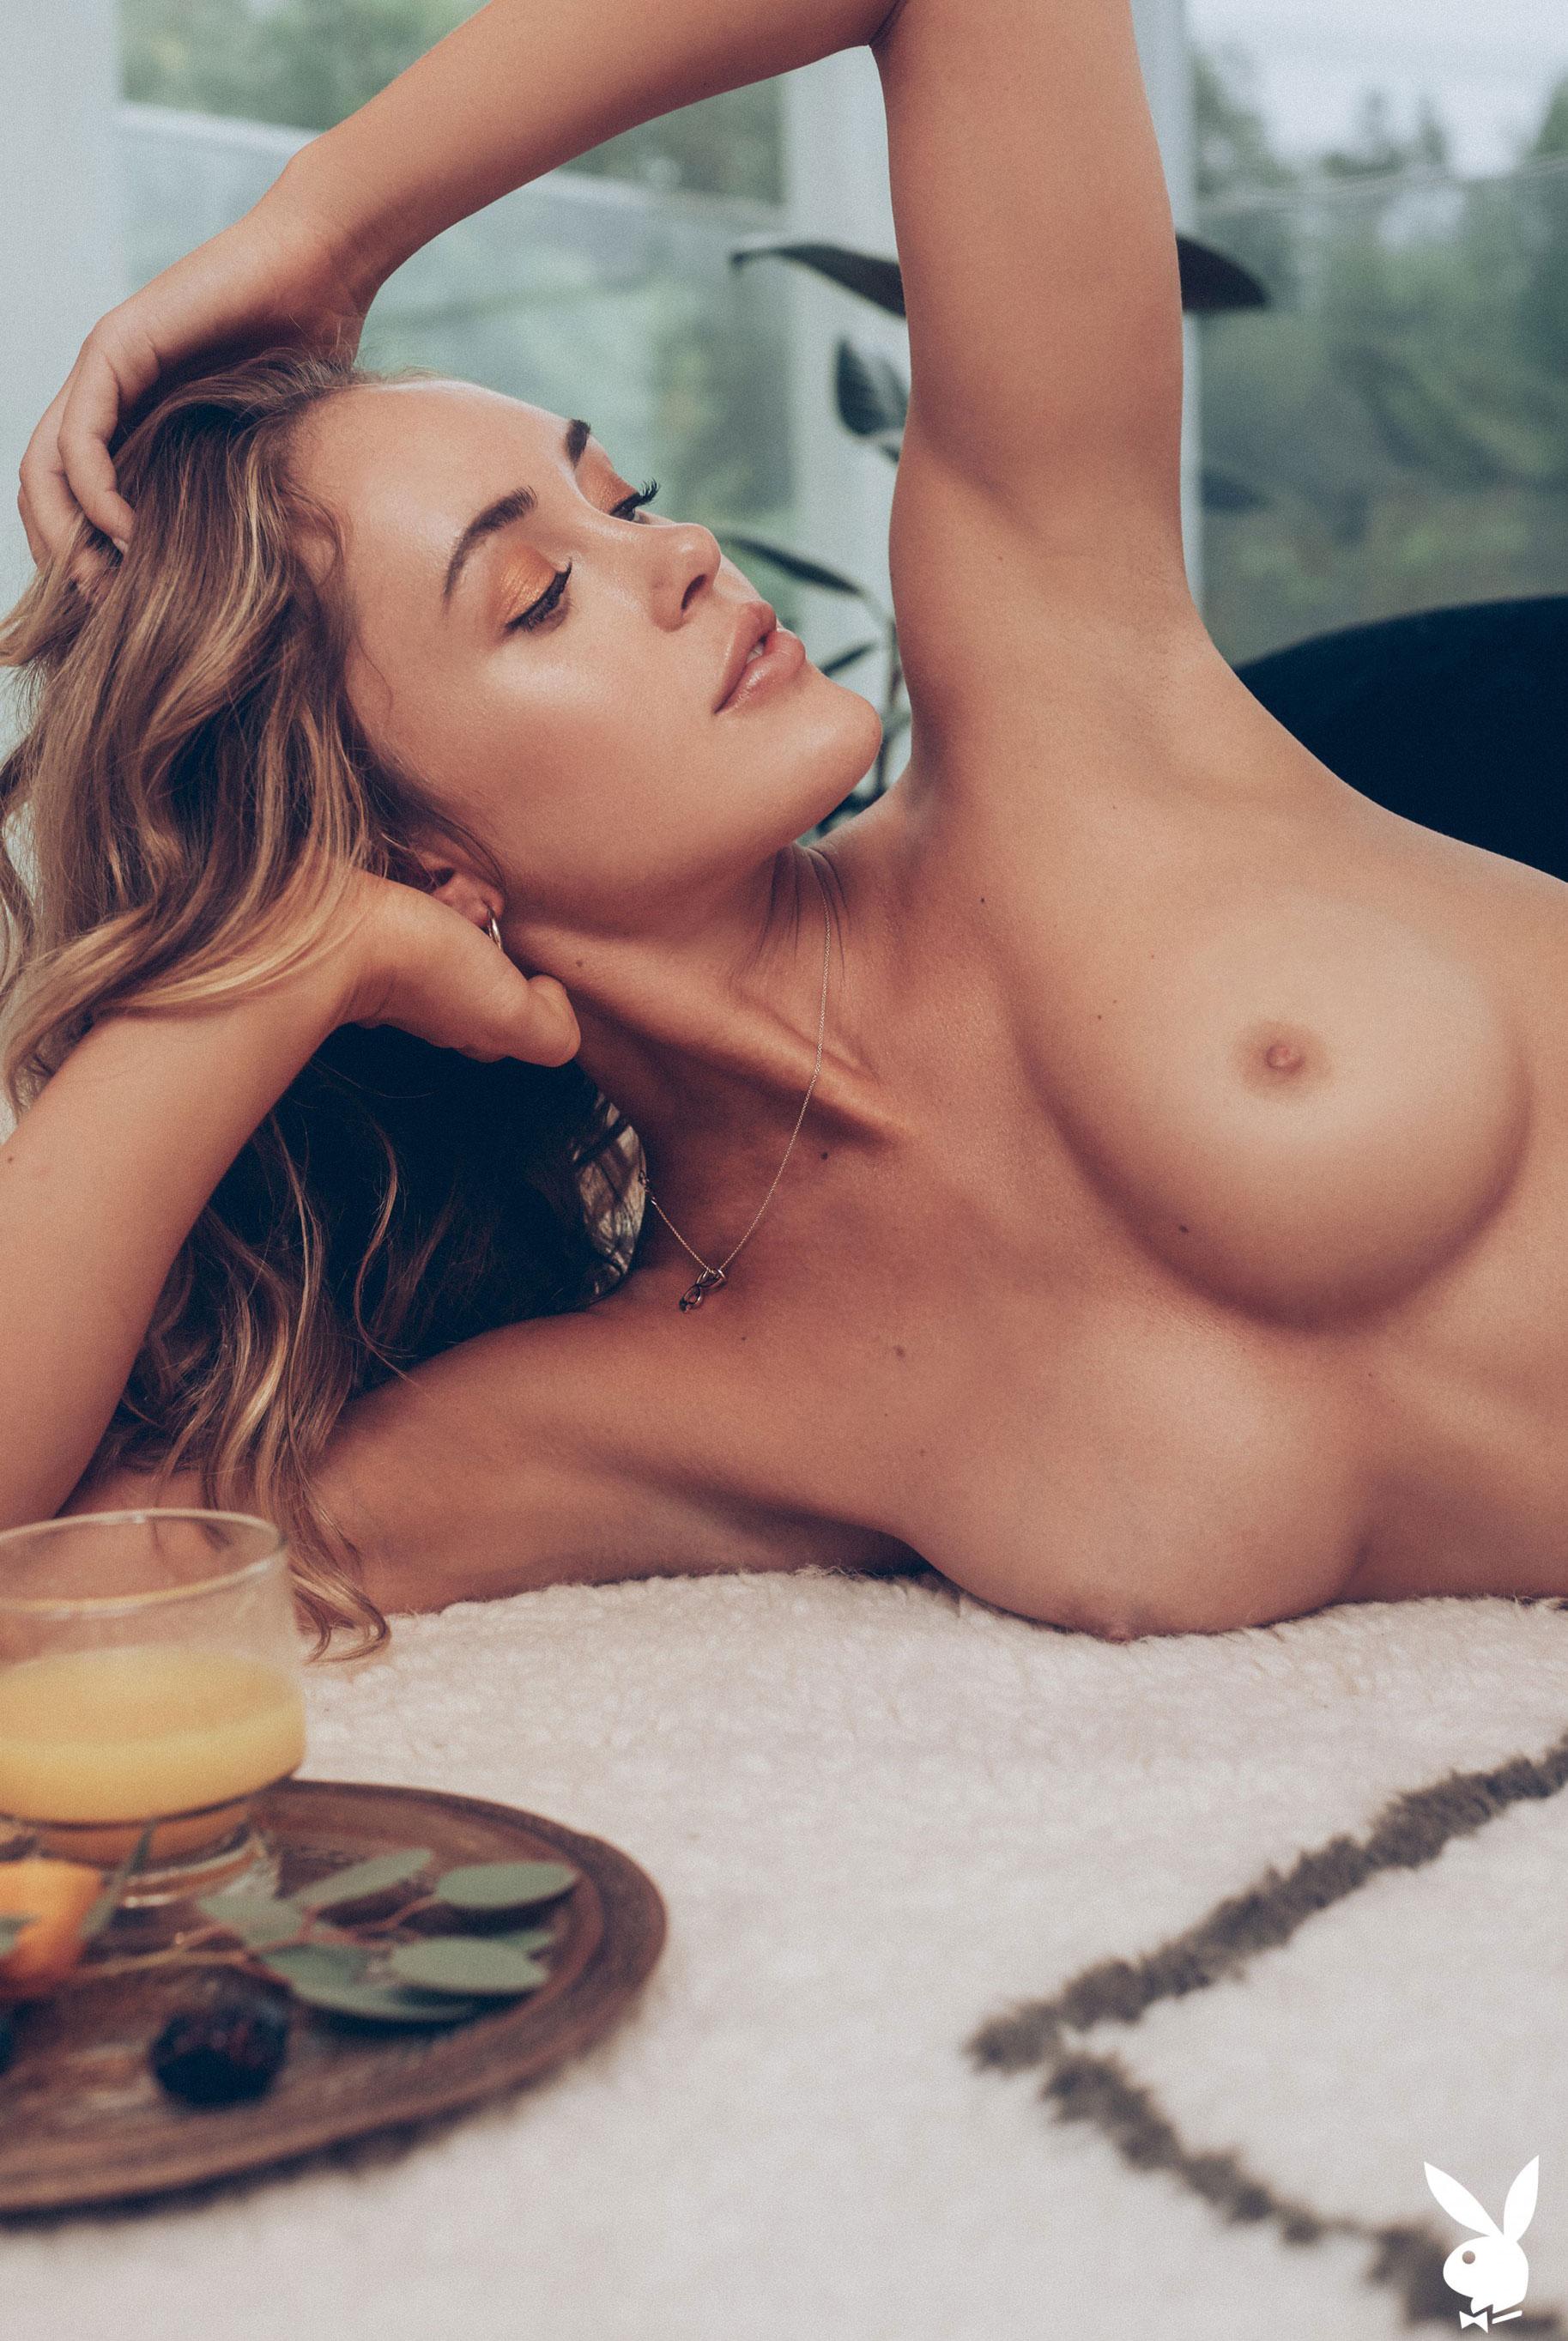 Девушка месяца Эбигейл О'Нил - Playboy США, май 2019 / фото 15